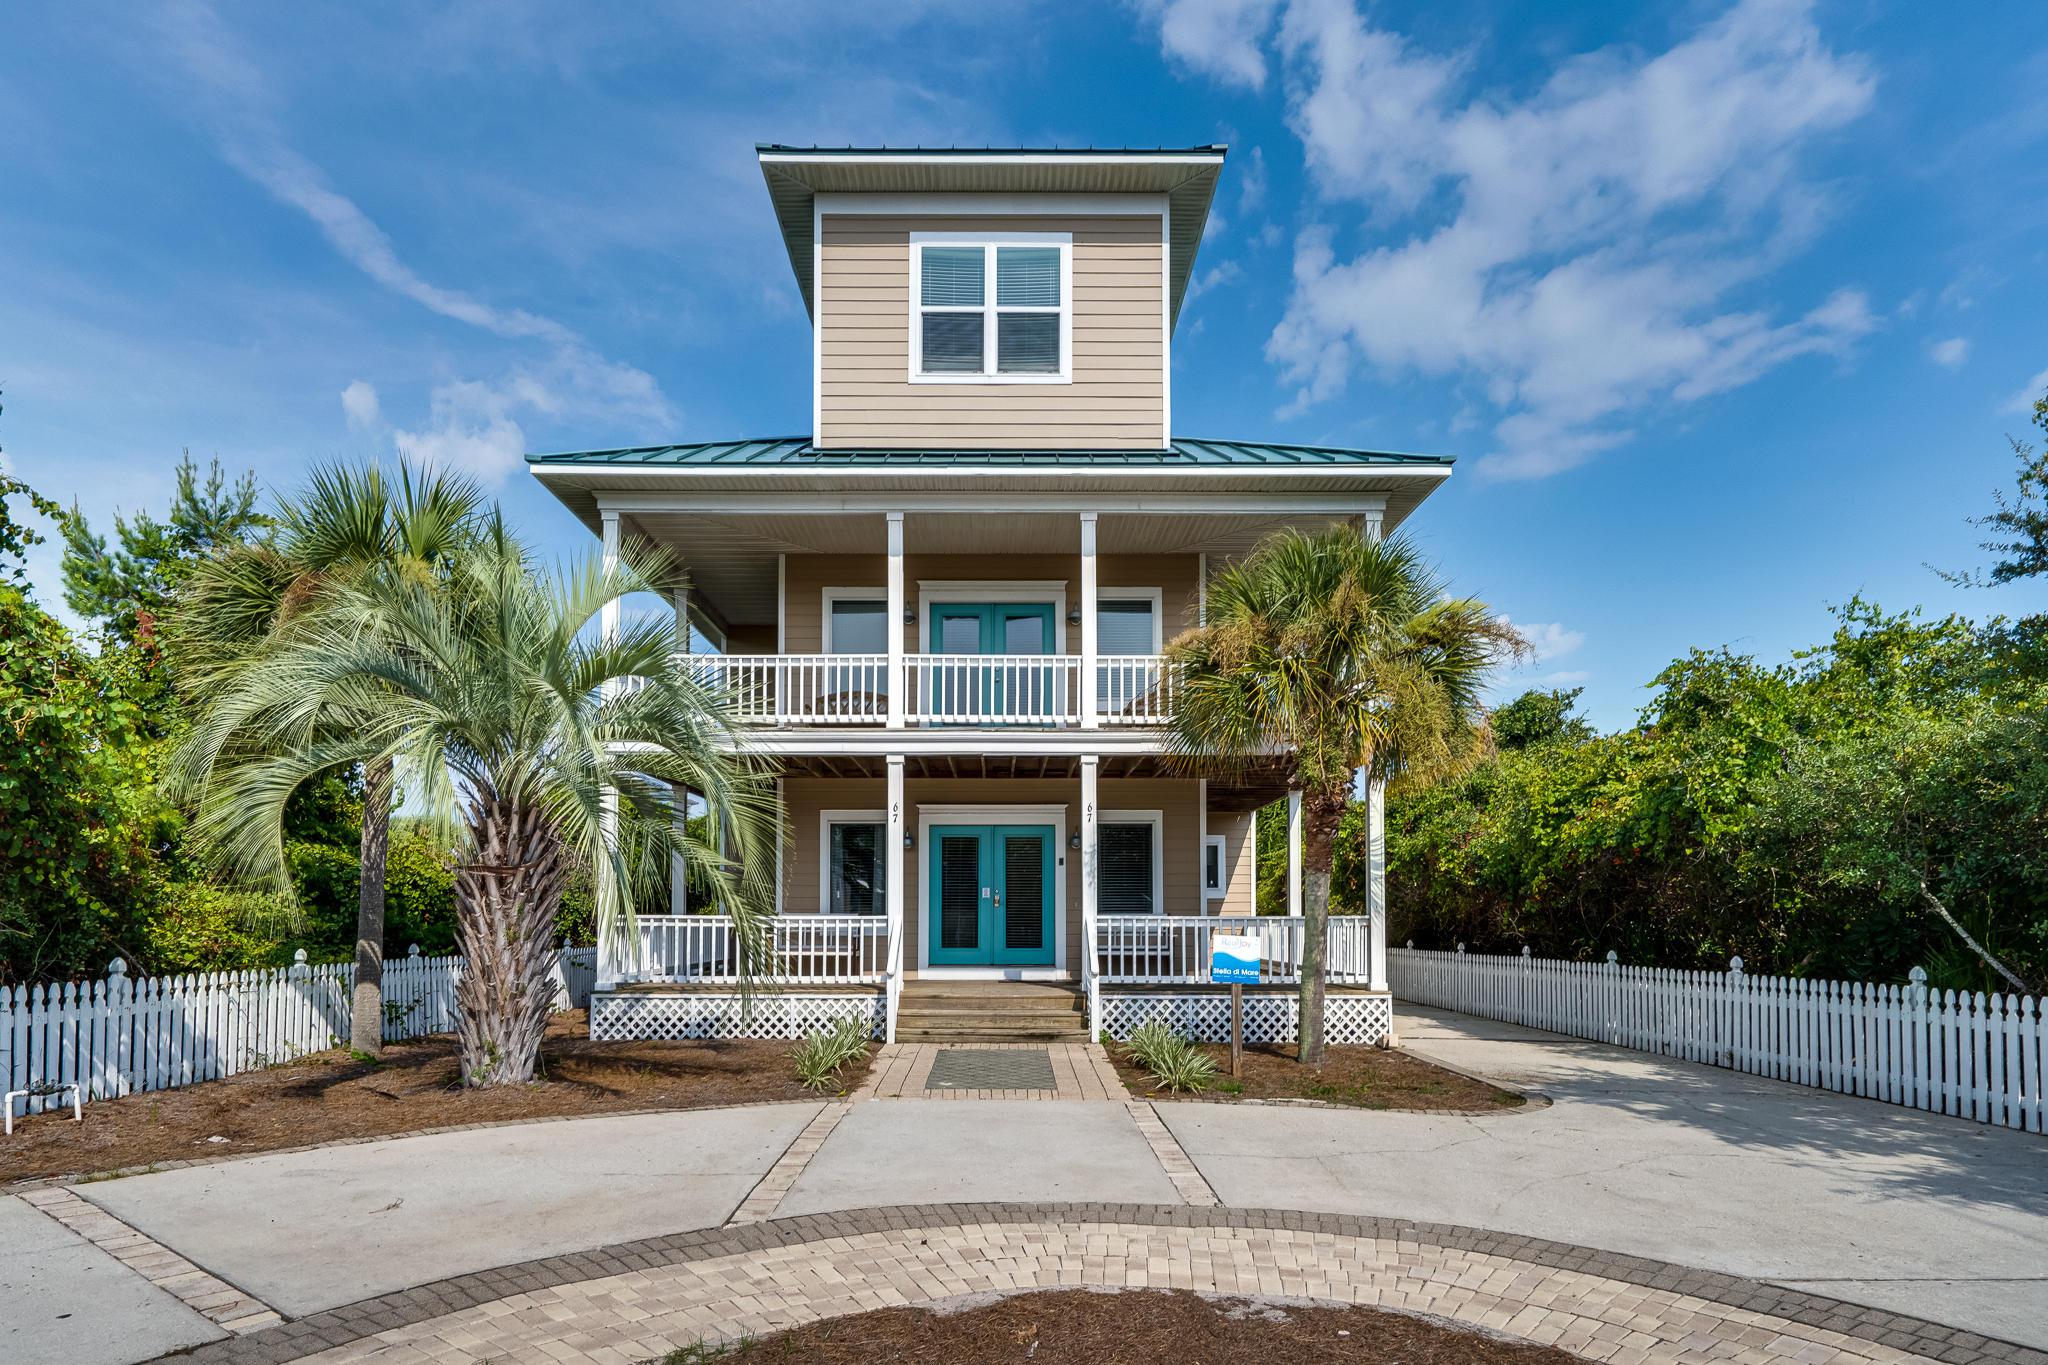 Photo of home for sale at 67 Cobia, Destin FL